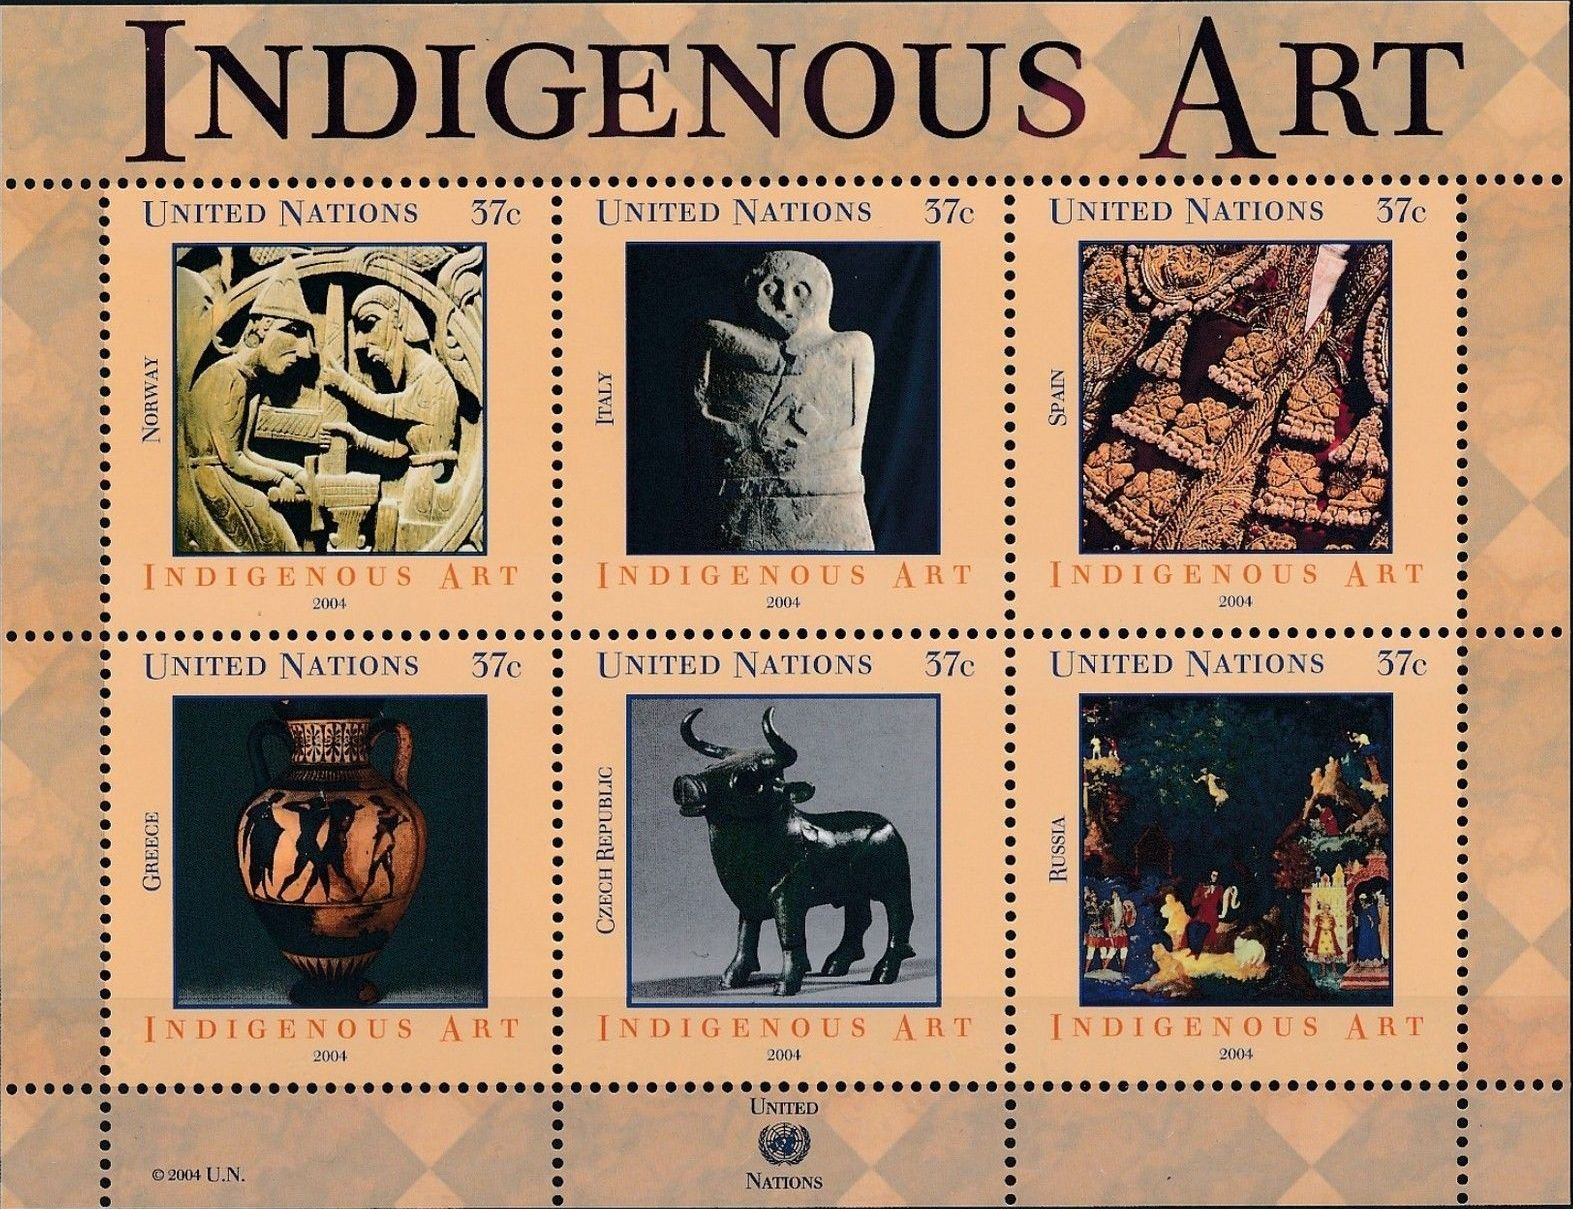 United Nations-New York 2004 Indigenous Art